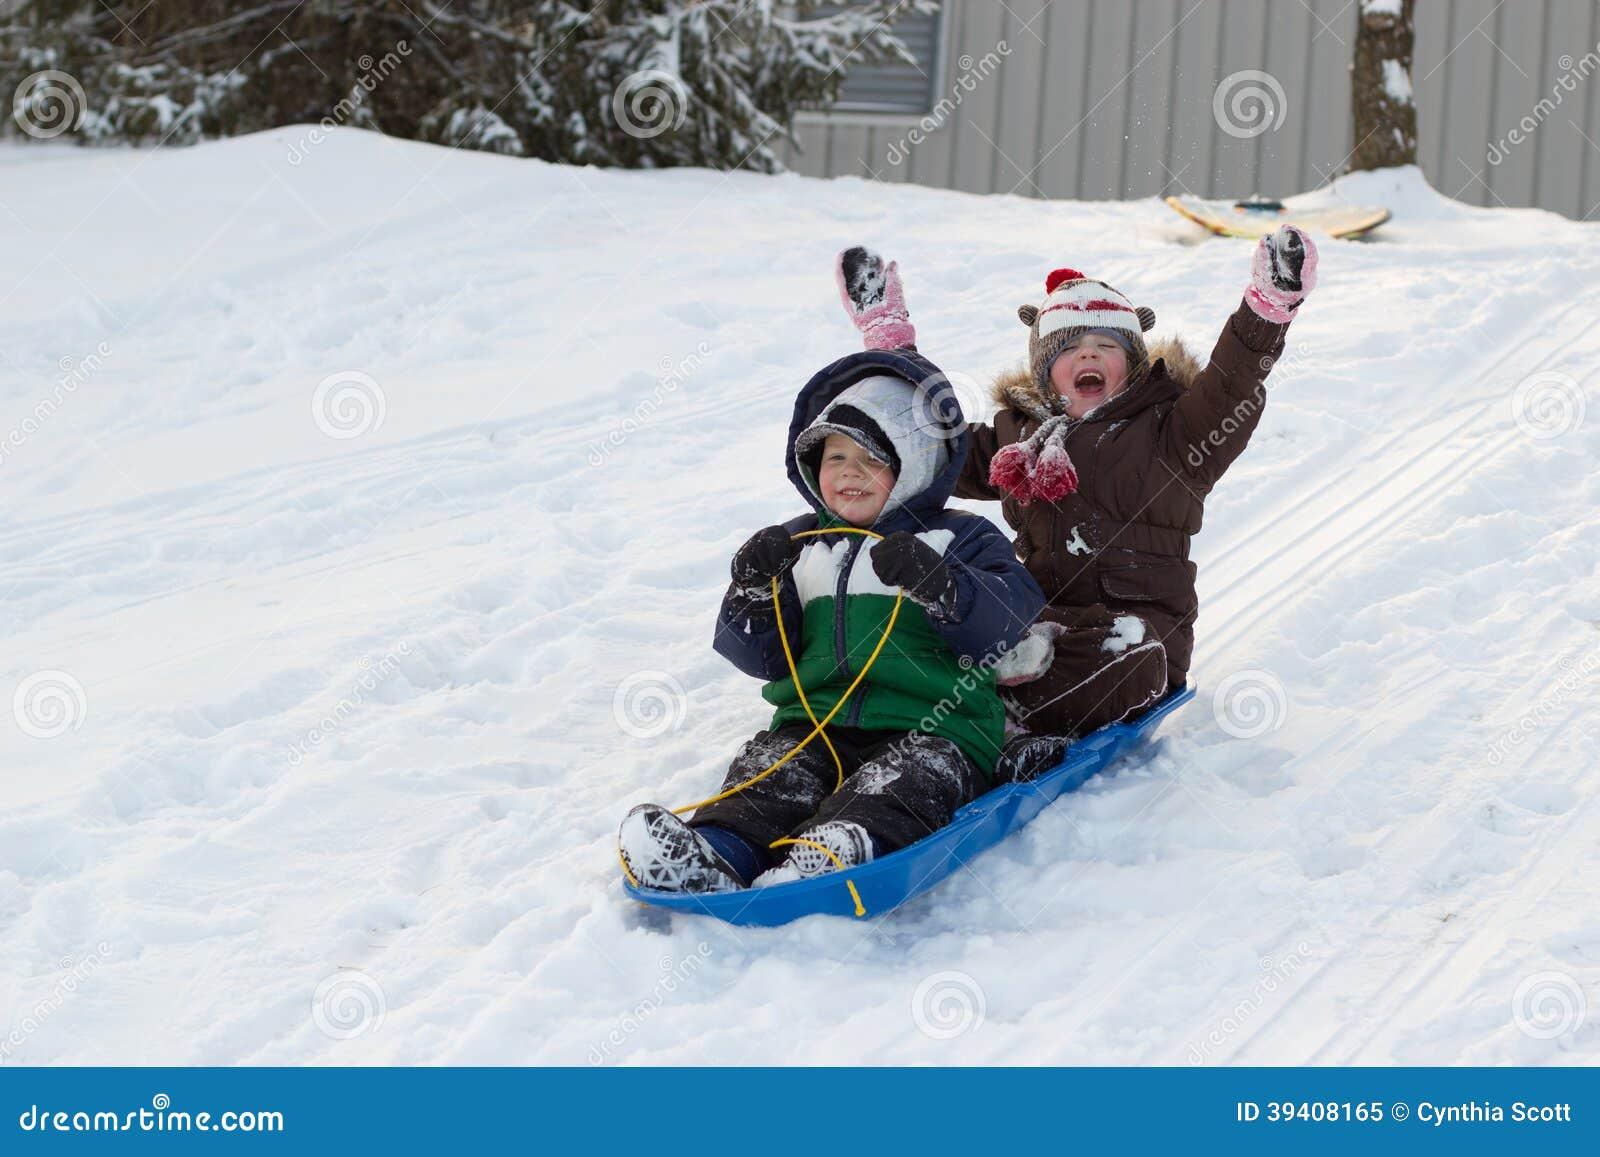 Children Kids Sledding Toboggan Sled Snow Winter Stock Photo - Image ...